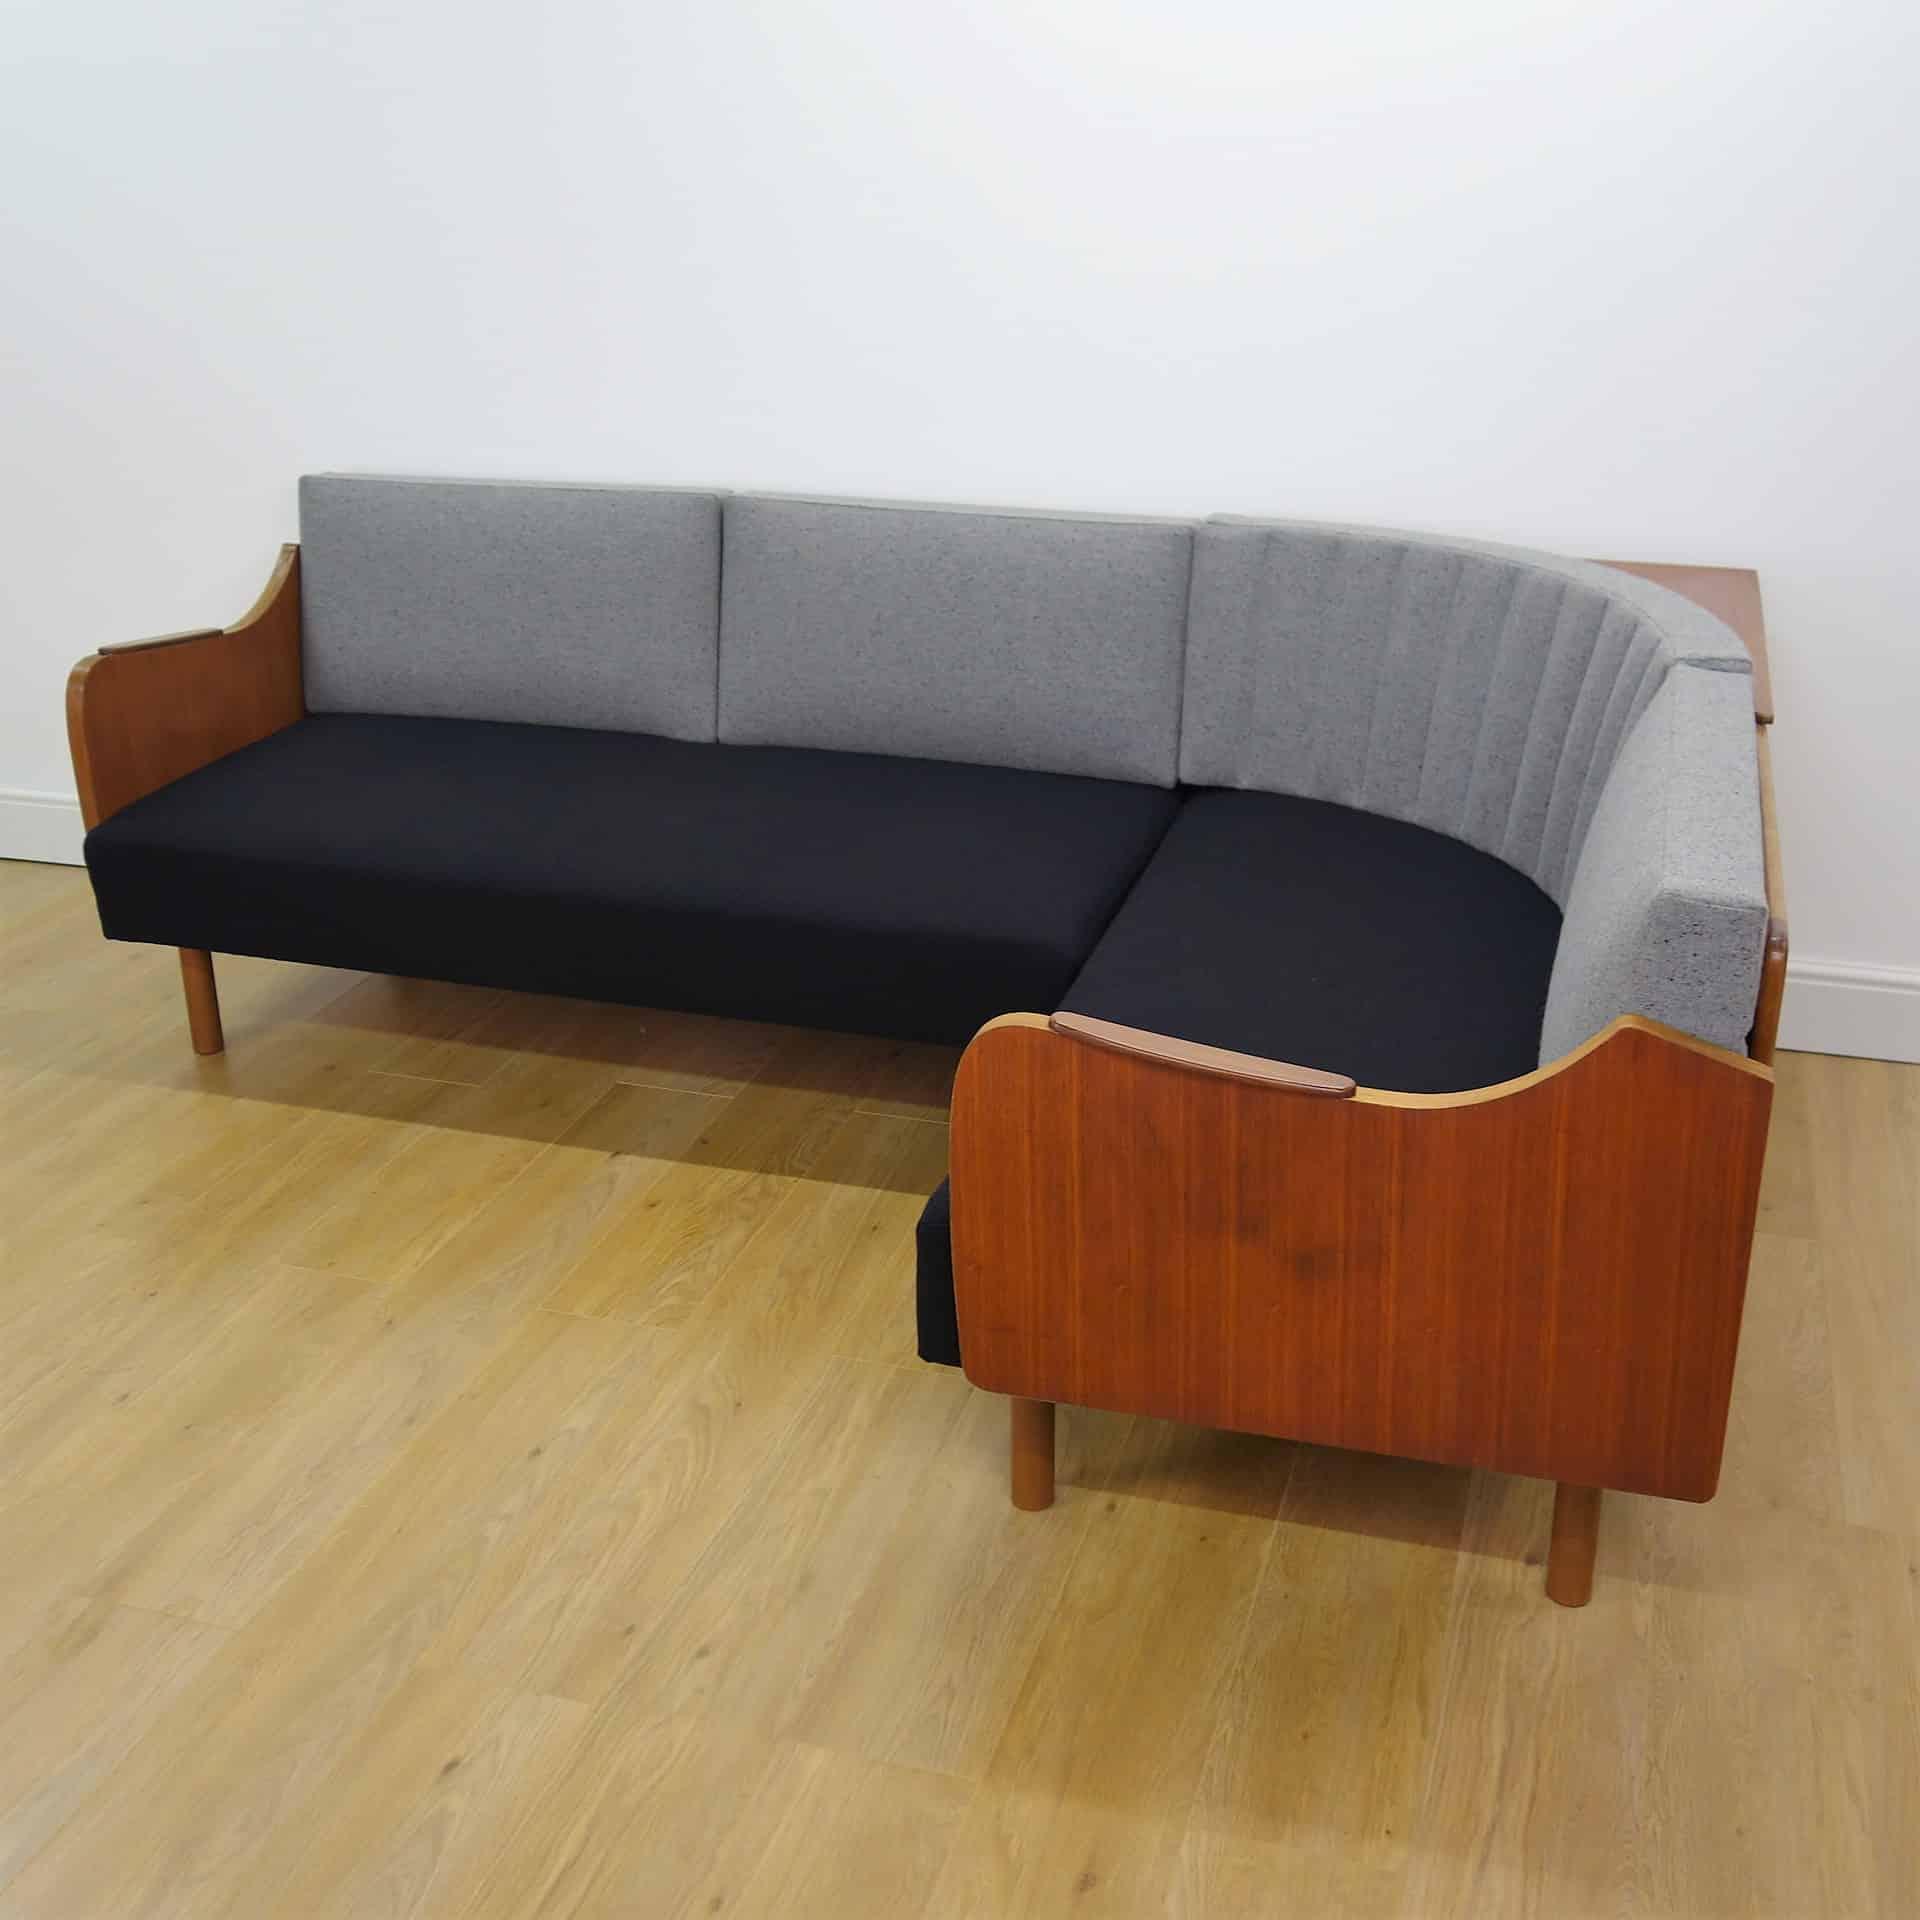 danish style sofa bed uk jual inoac tangerang 1960s teak corner day mark parrish mid